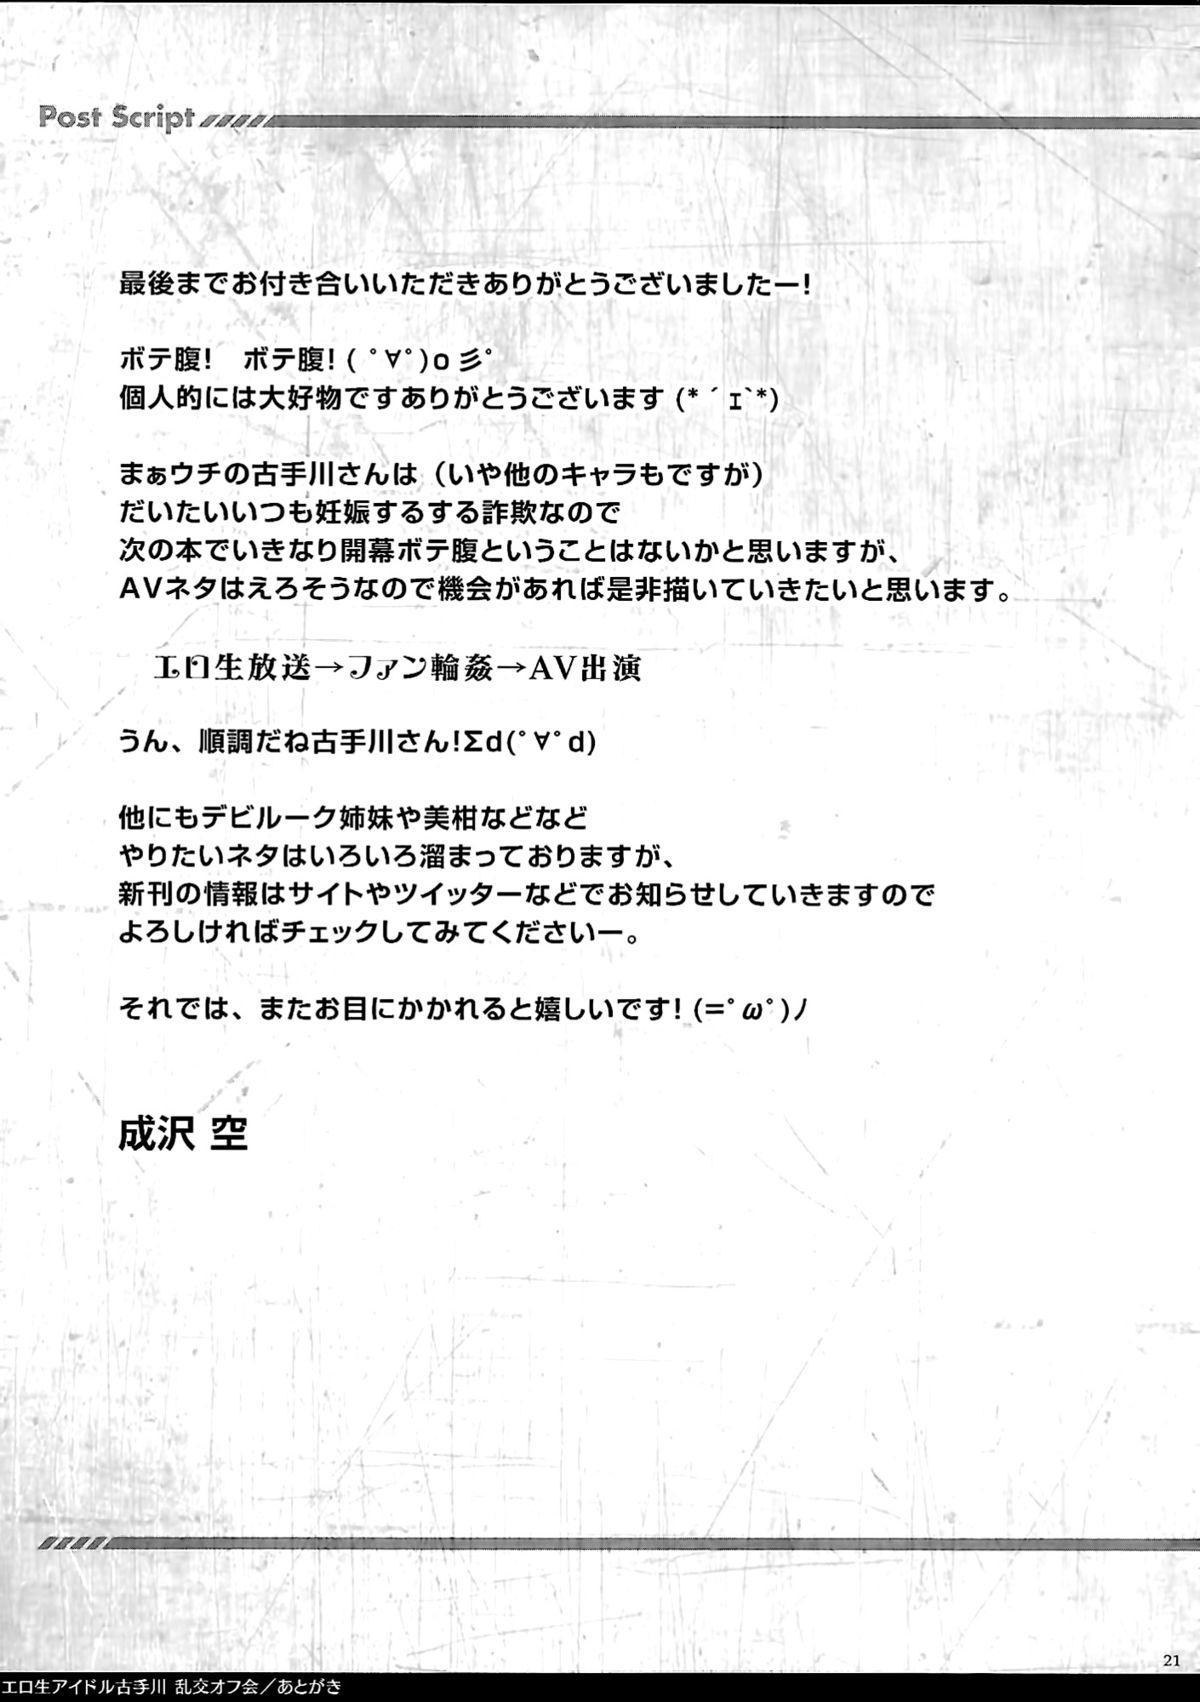 (C86) [Sorairo March (Narusawa Sora)] Eronama Idol Kotegawa - Rankou Off-kai | Erotic Idol Kotegawa - Offline Orgy Meeting (To LOVE-Ru) [English] {doujin-moe.us} 19